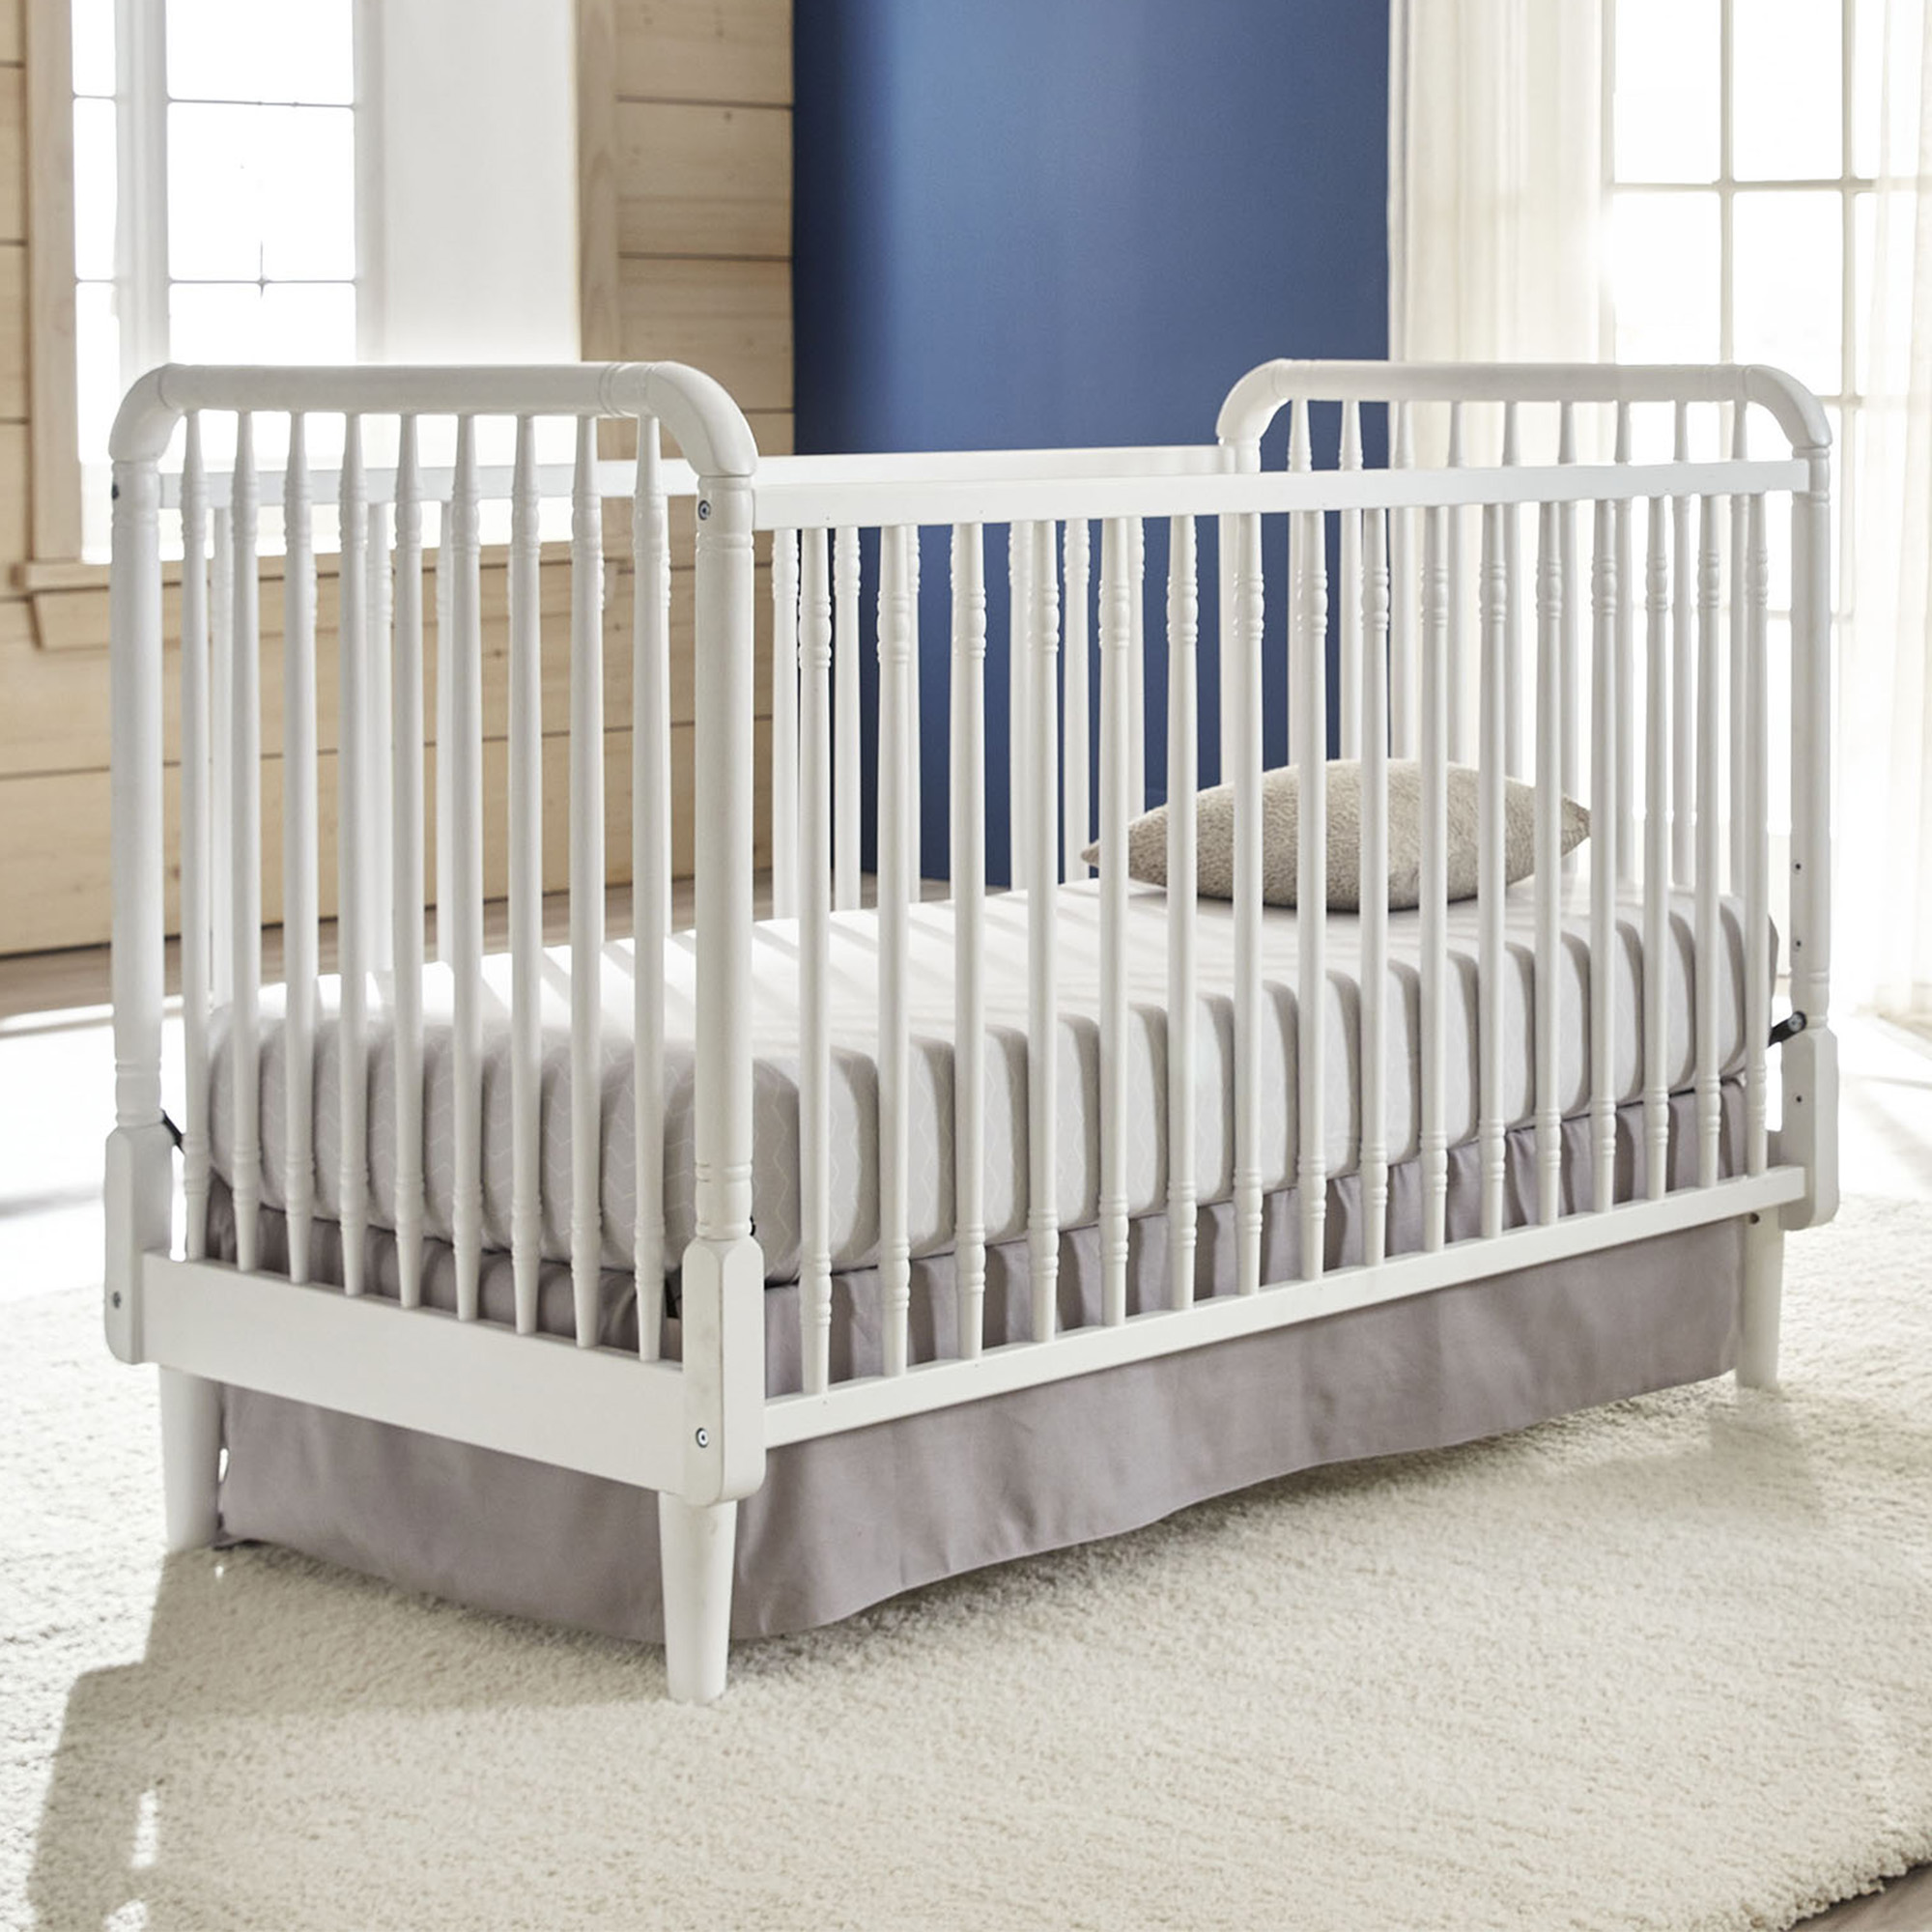 convertible cribs baby jenny resizeggg lind in copeland davinci angle crib